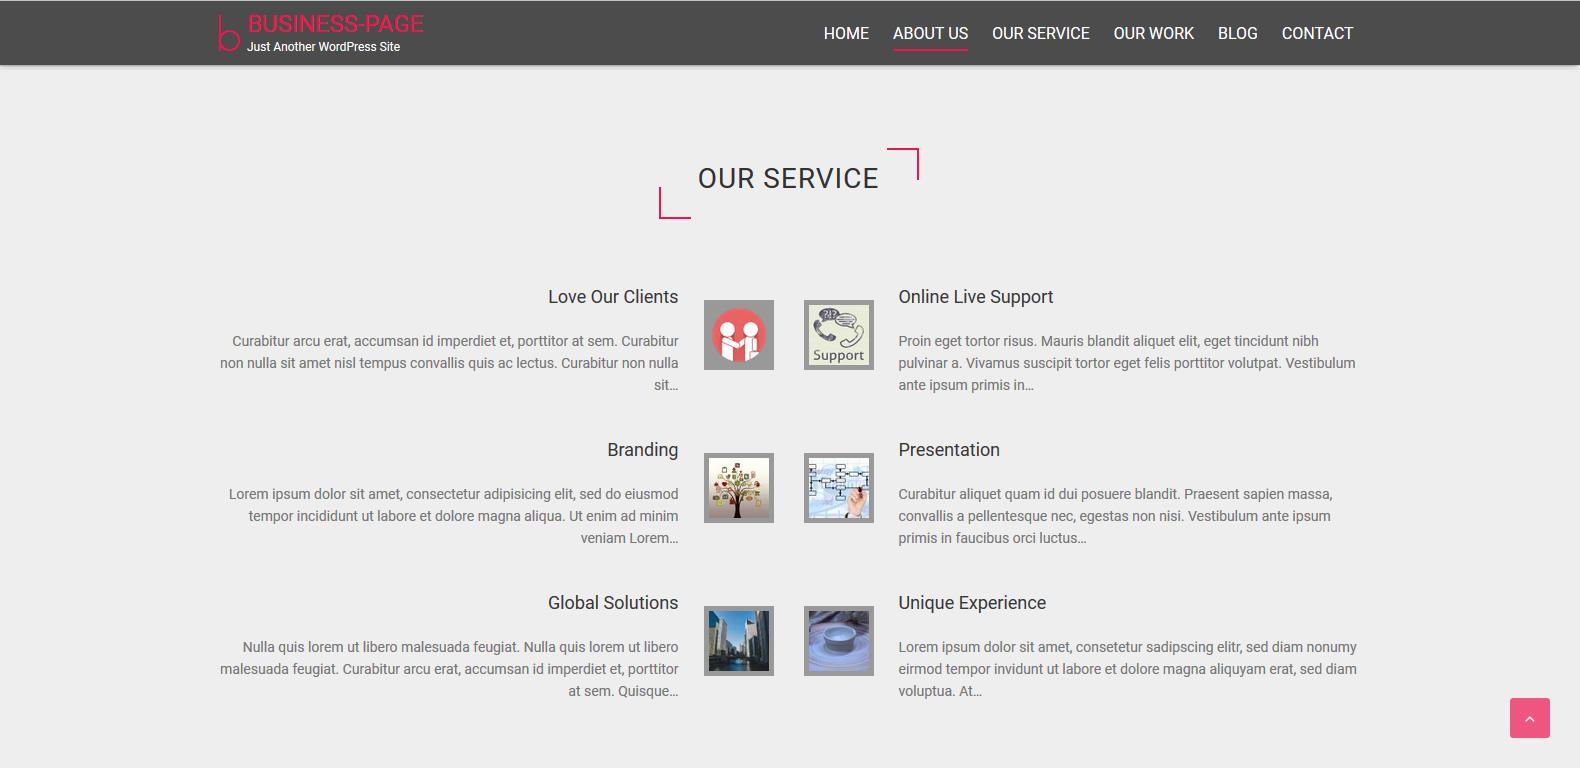 WordPress单页企业主题:Business Page